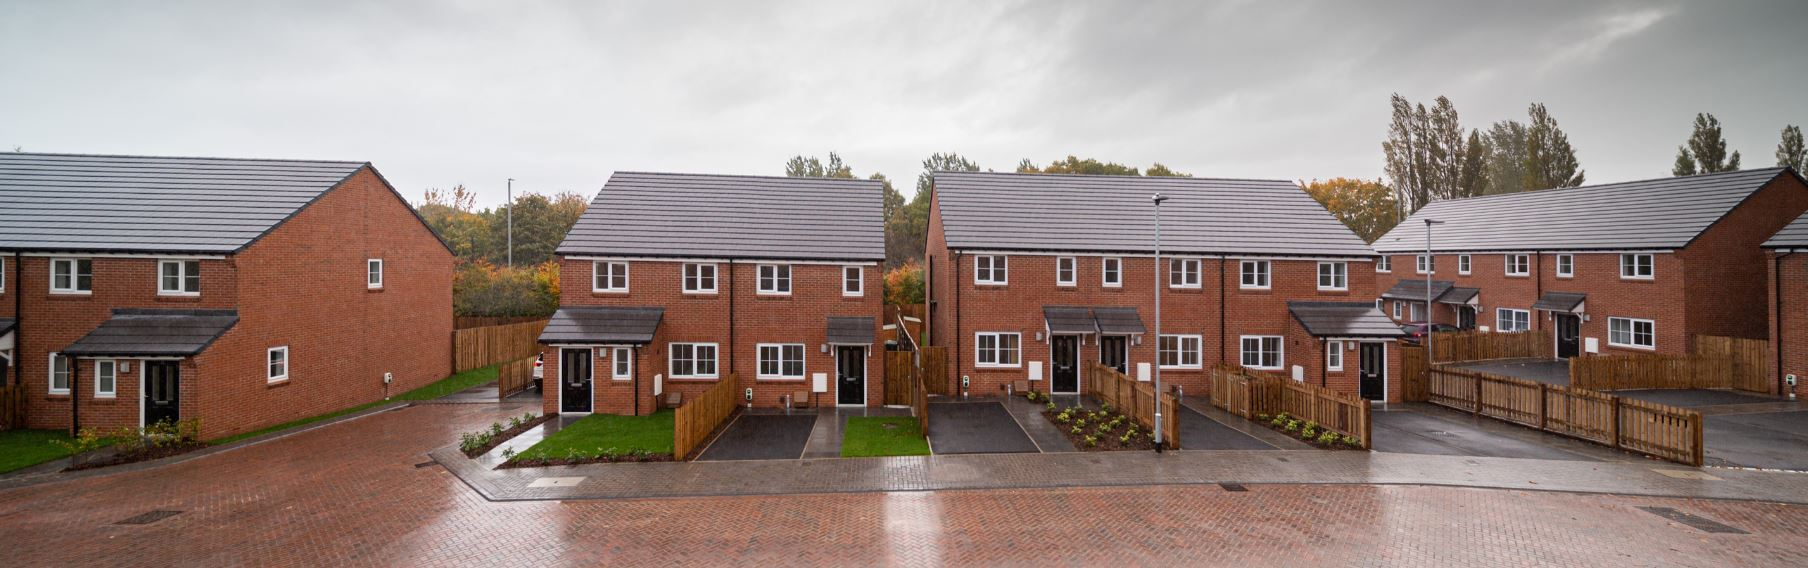 Esh Construction - Affordable Housing